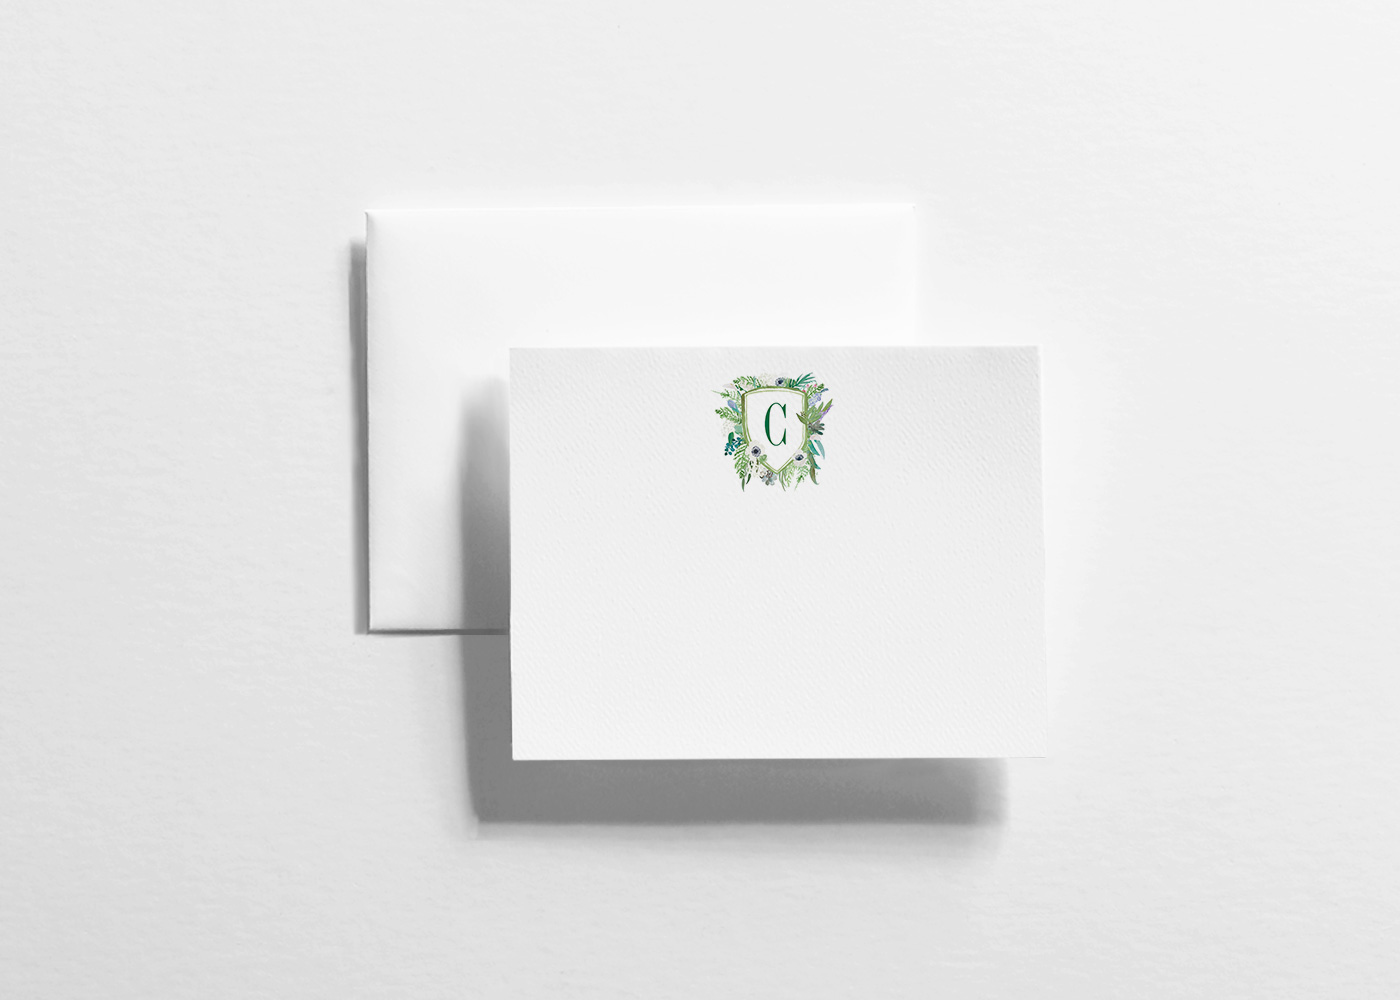 LoveLore_A2-Card_SP18_Botanical-Bliss.jpg